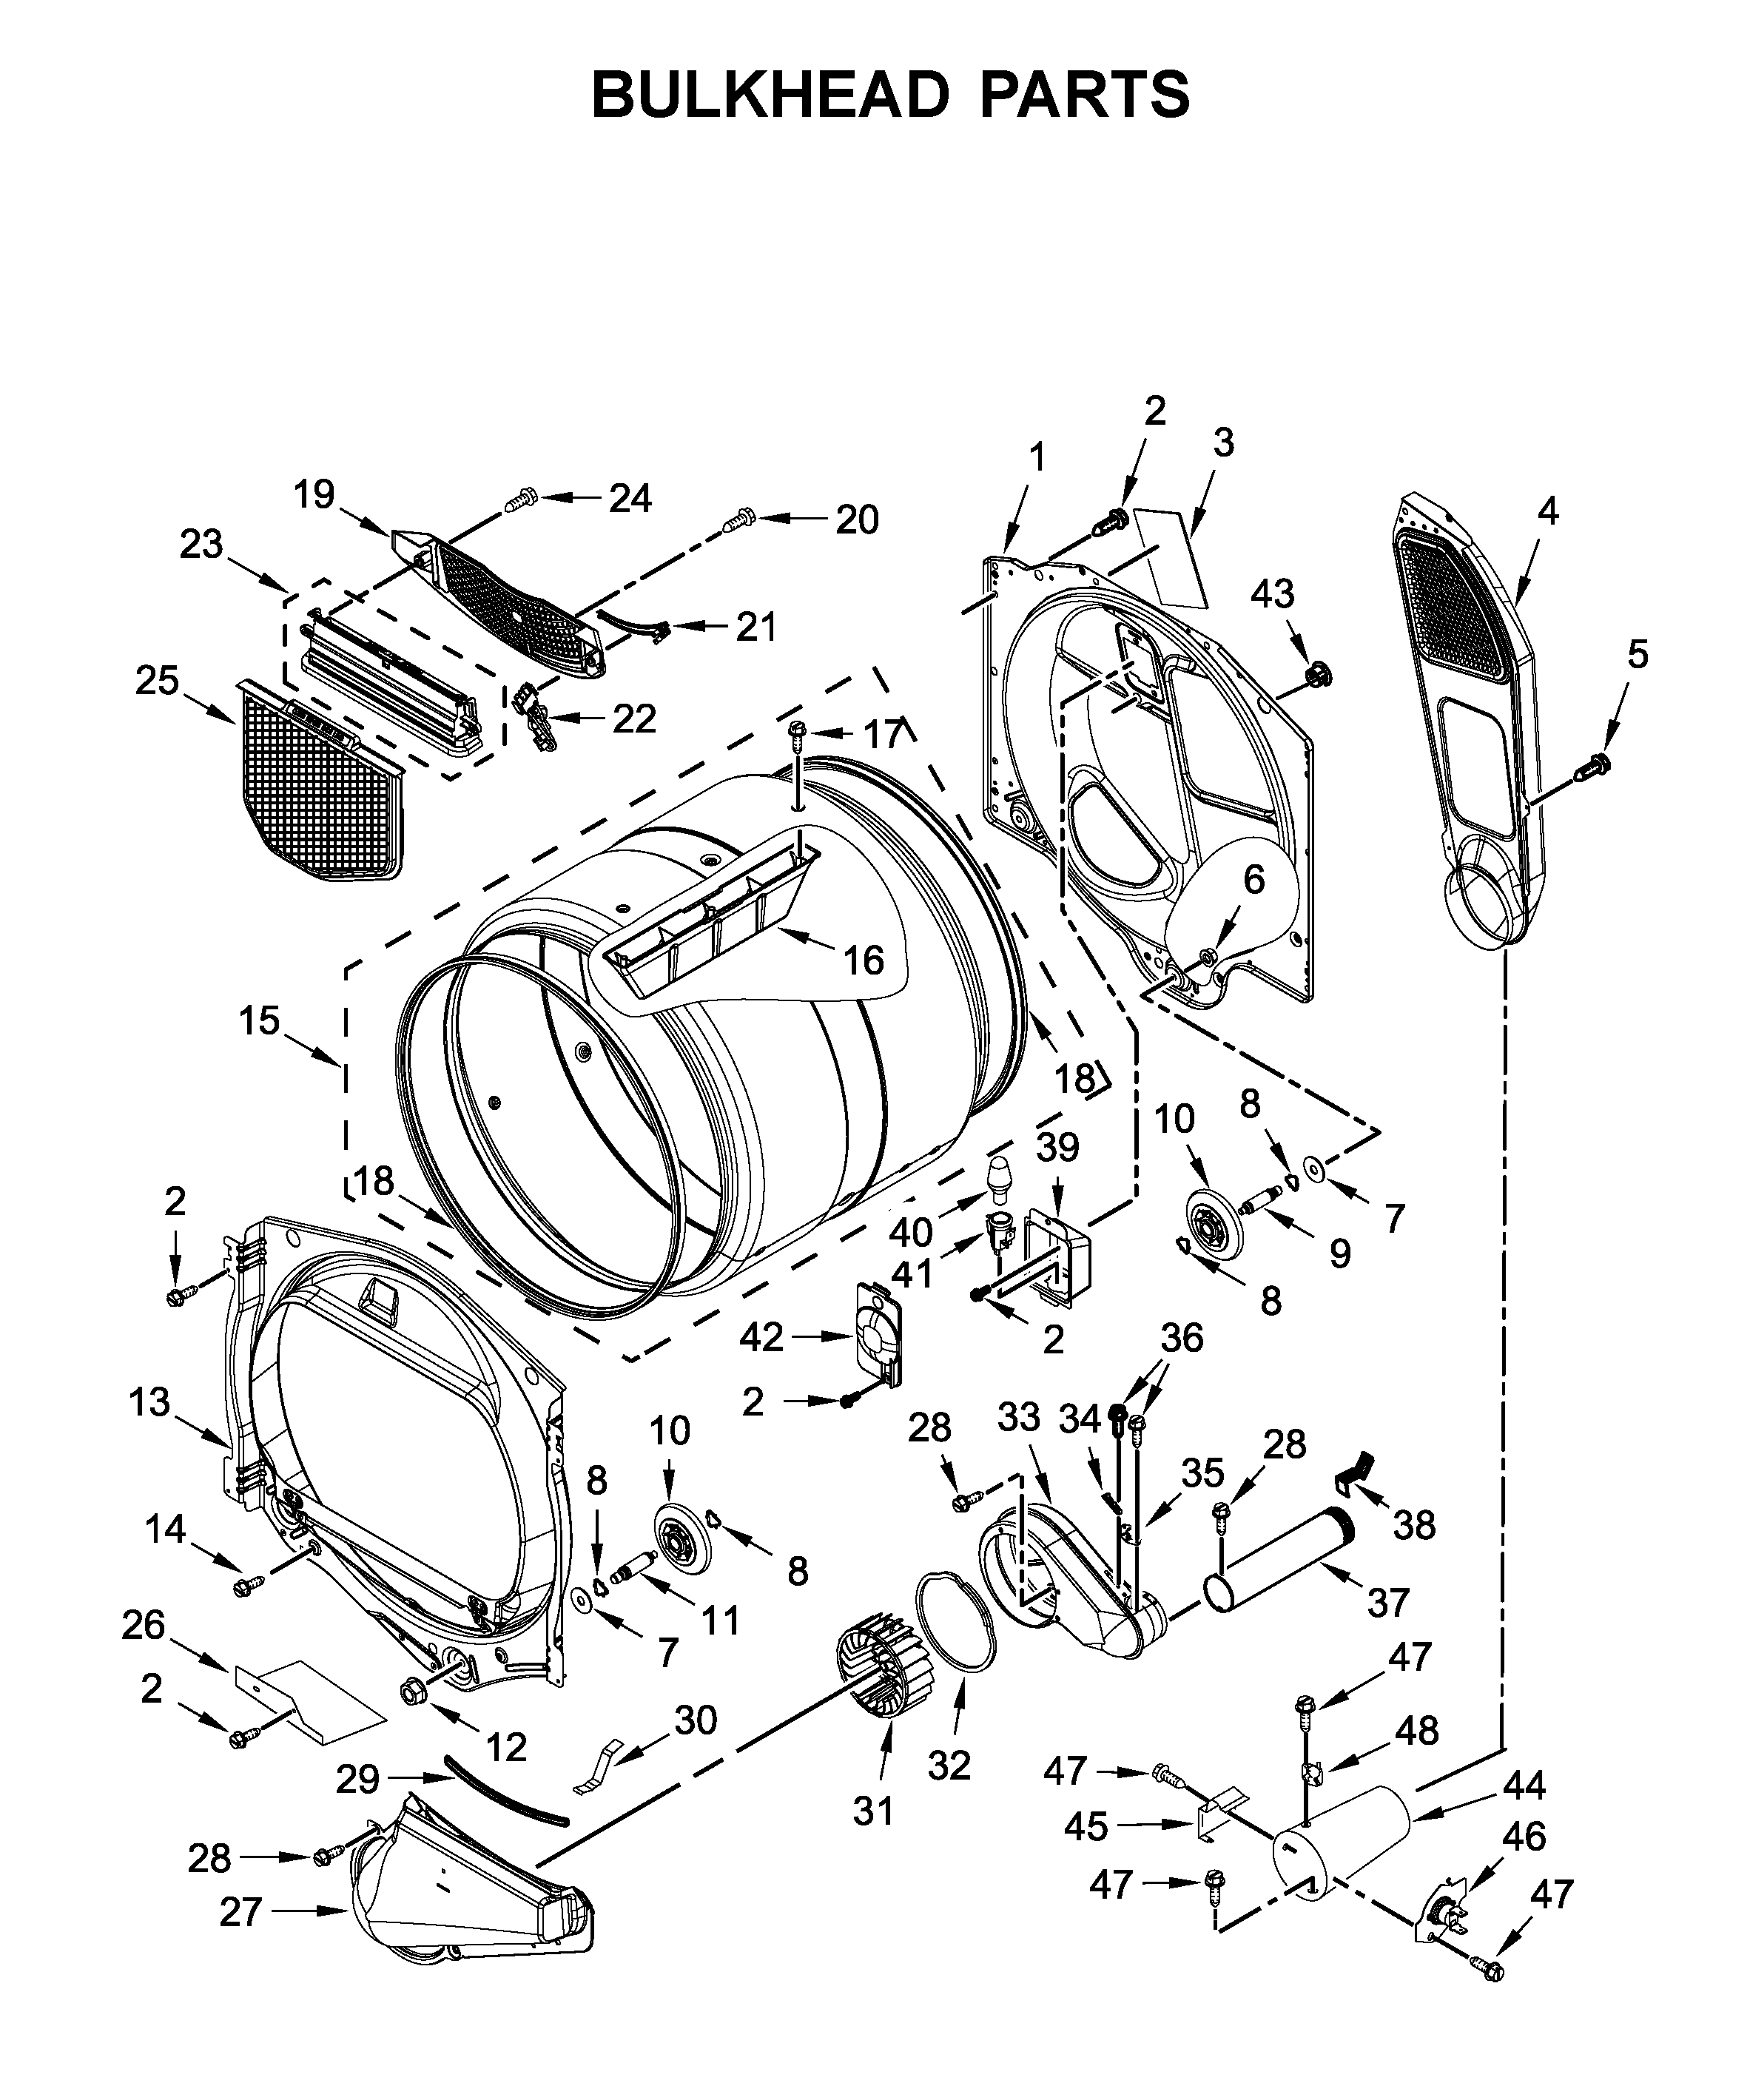 Whirlpool  Dryer  Bulkhead parts